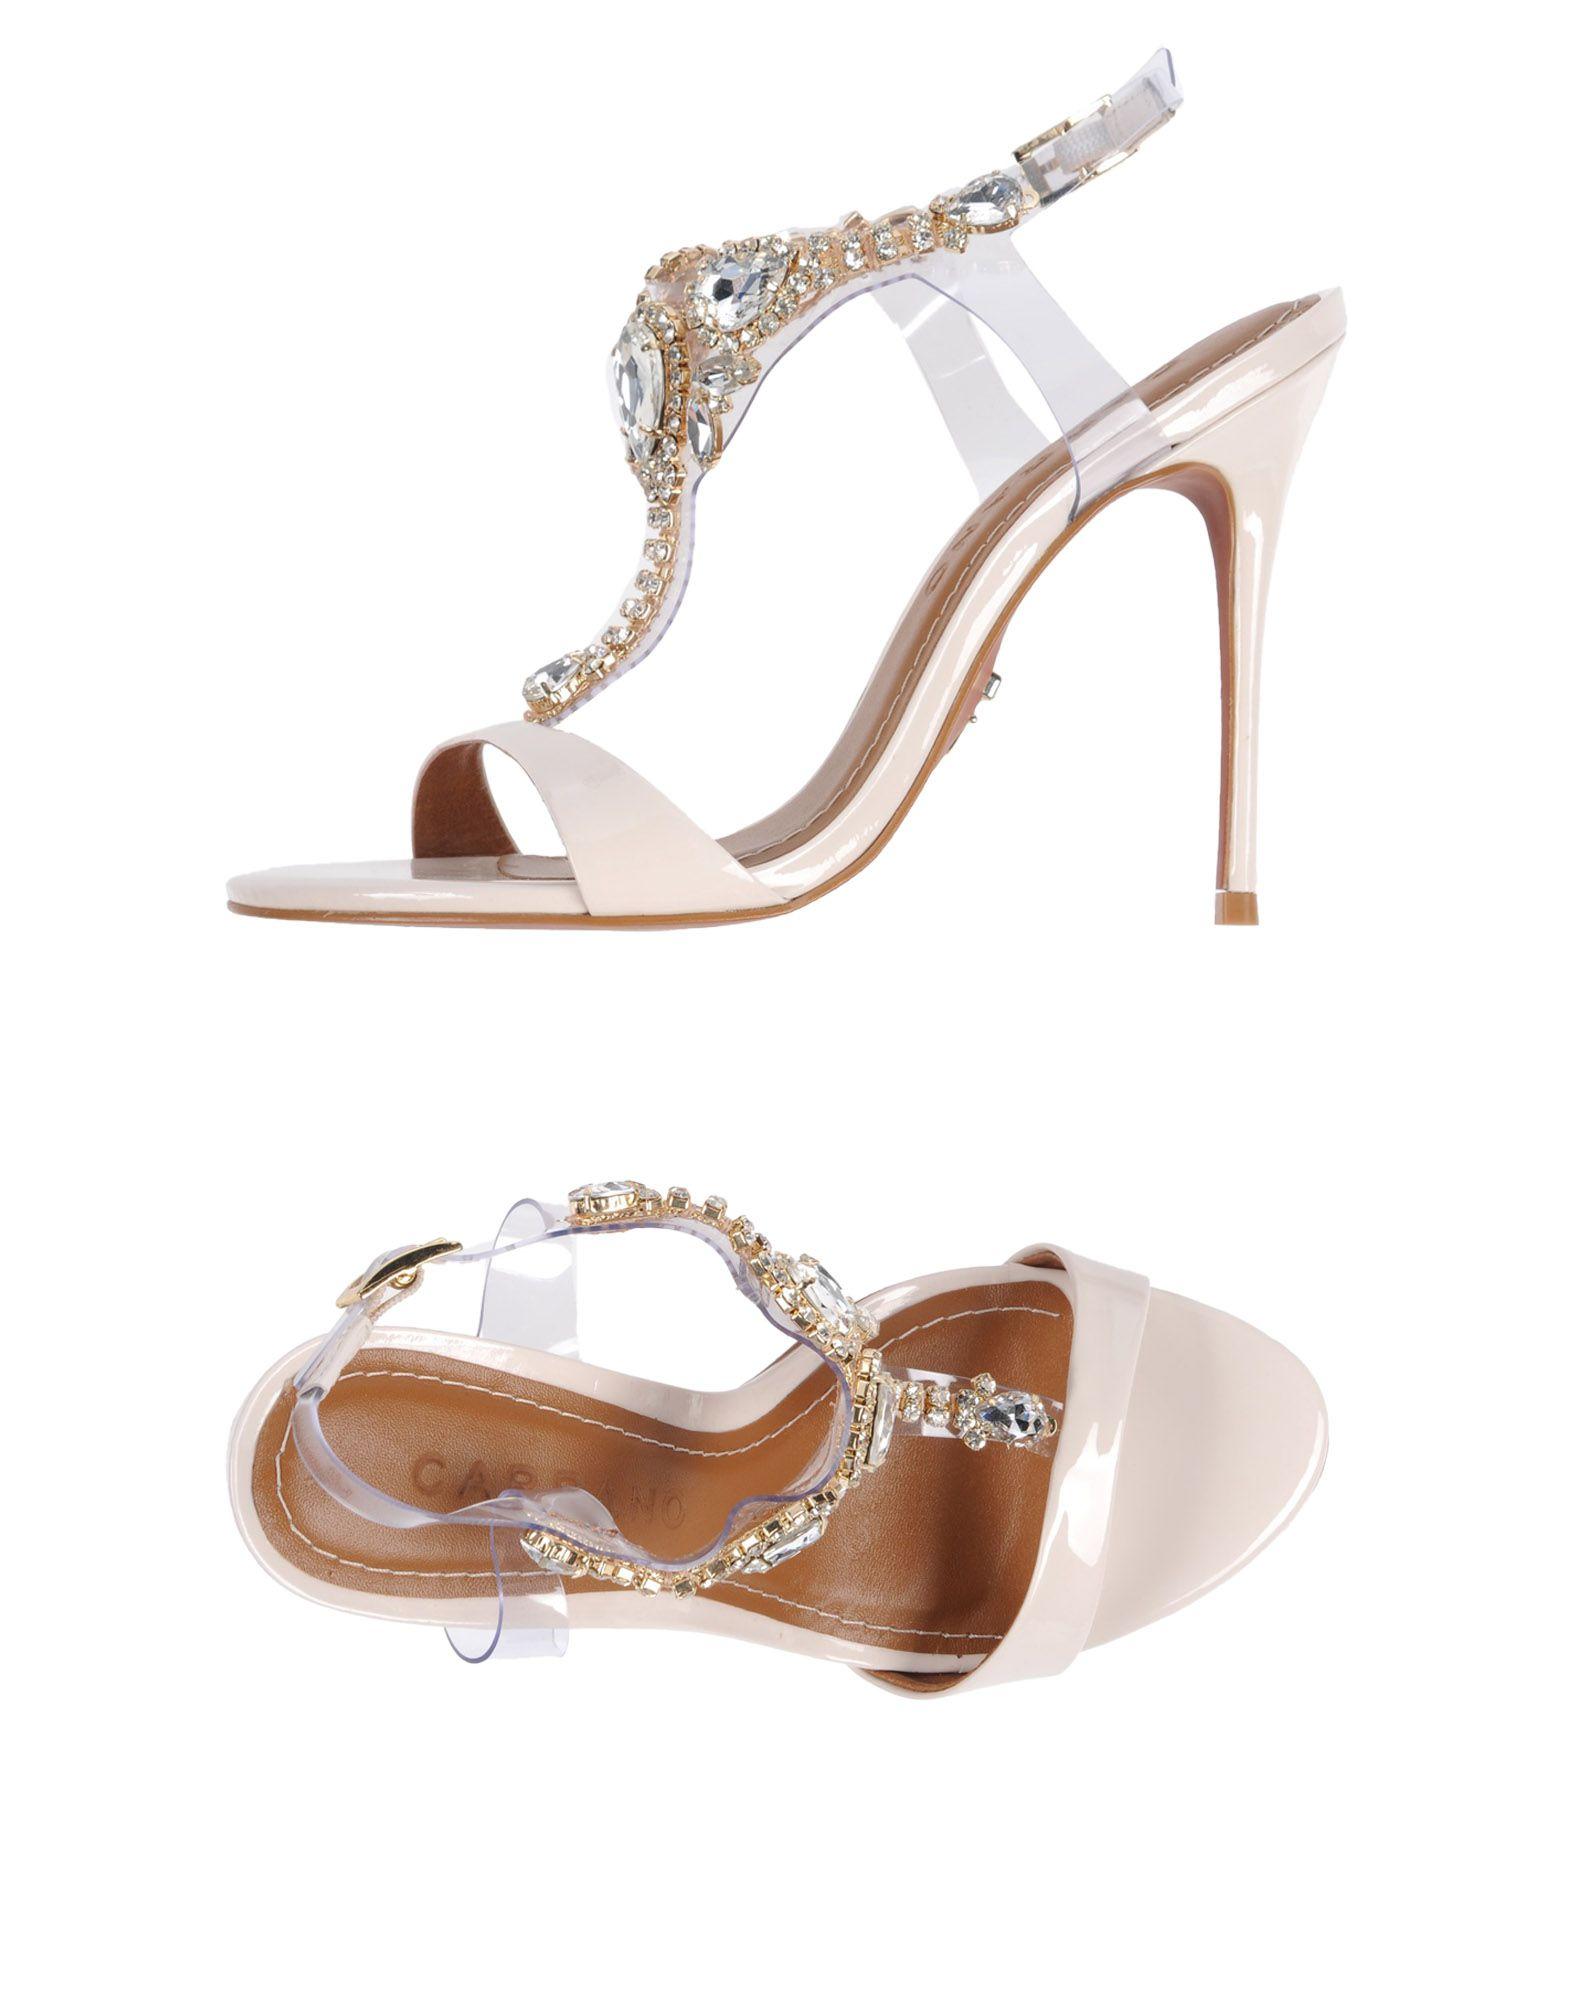 Moda Sandali Carrano Donna Donna Carrano - 11435965ST 56d0e4